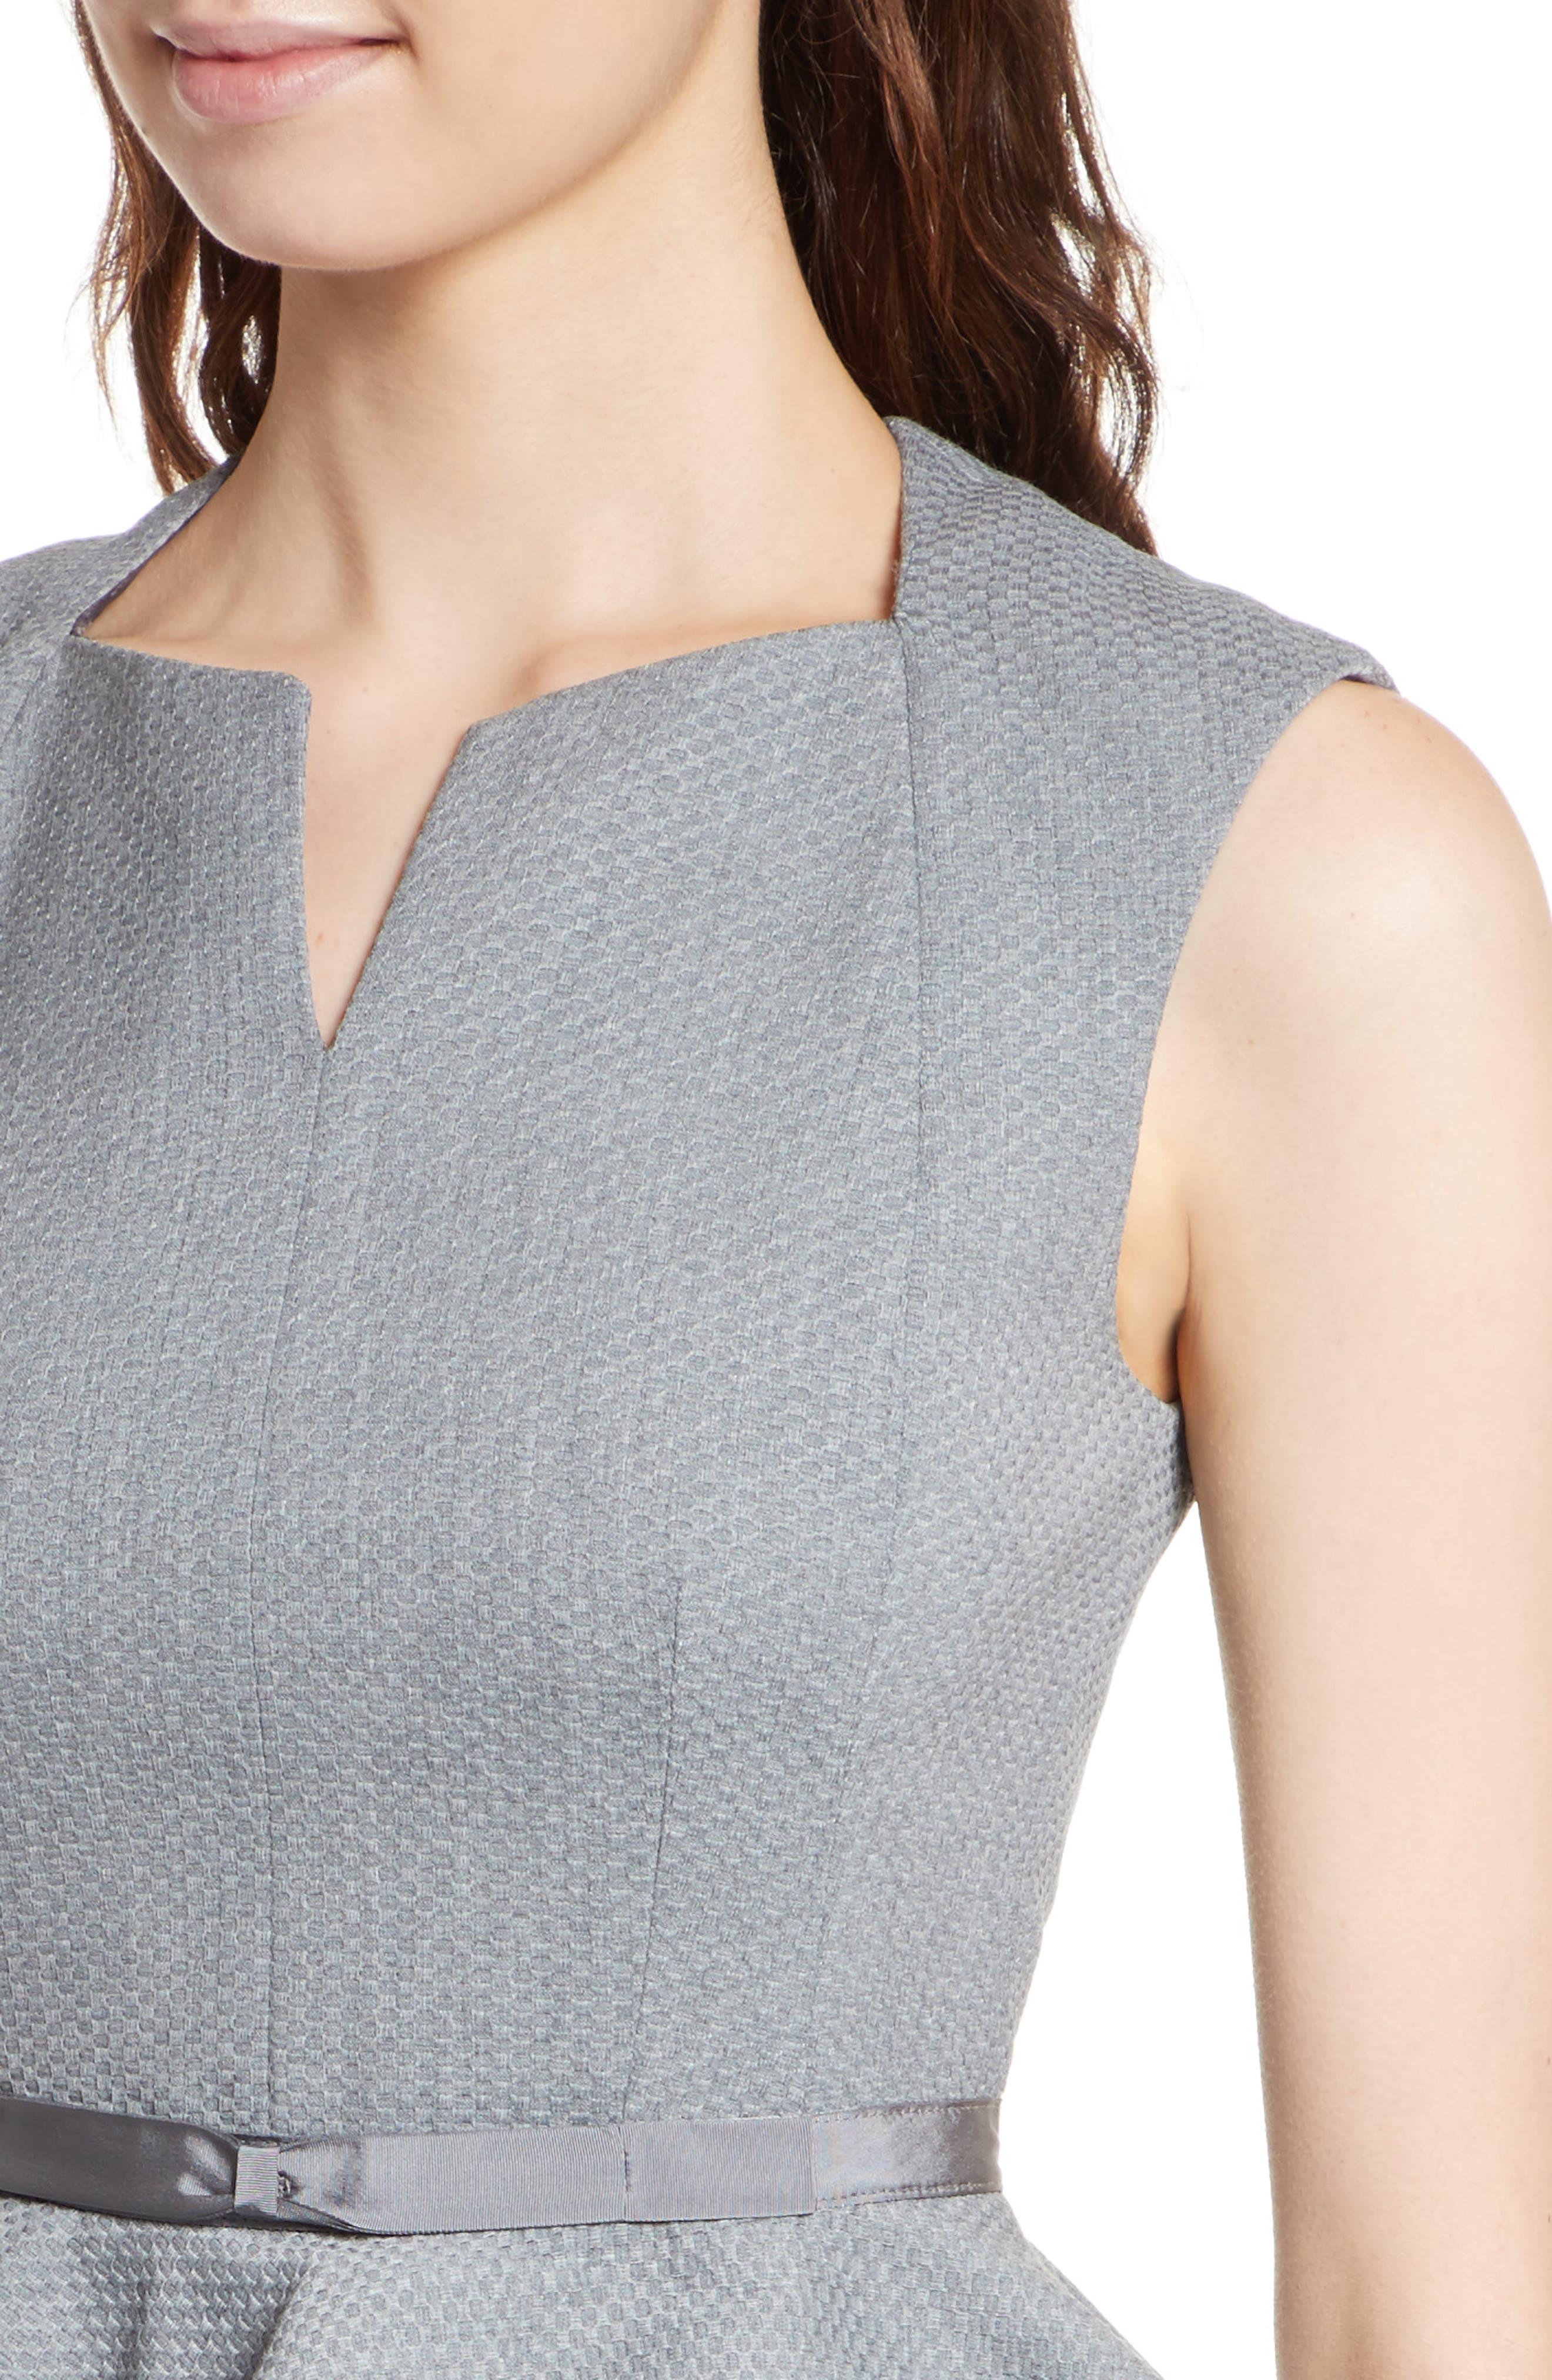 Nadaed Bow Detail Textured Peplum Dress,                             Alternate thumbnail 4, color,                             021